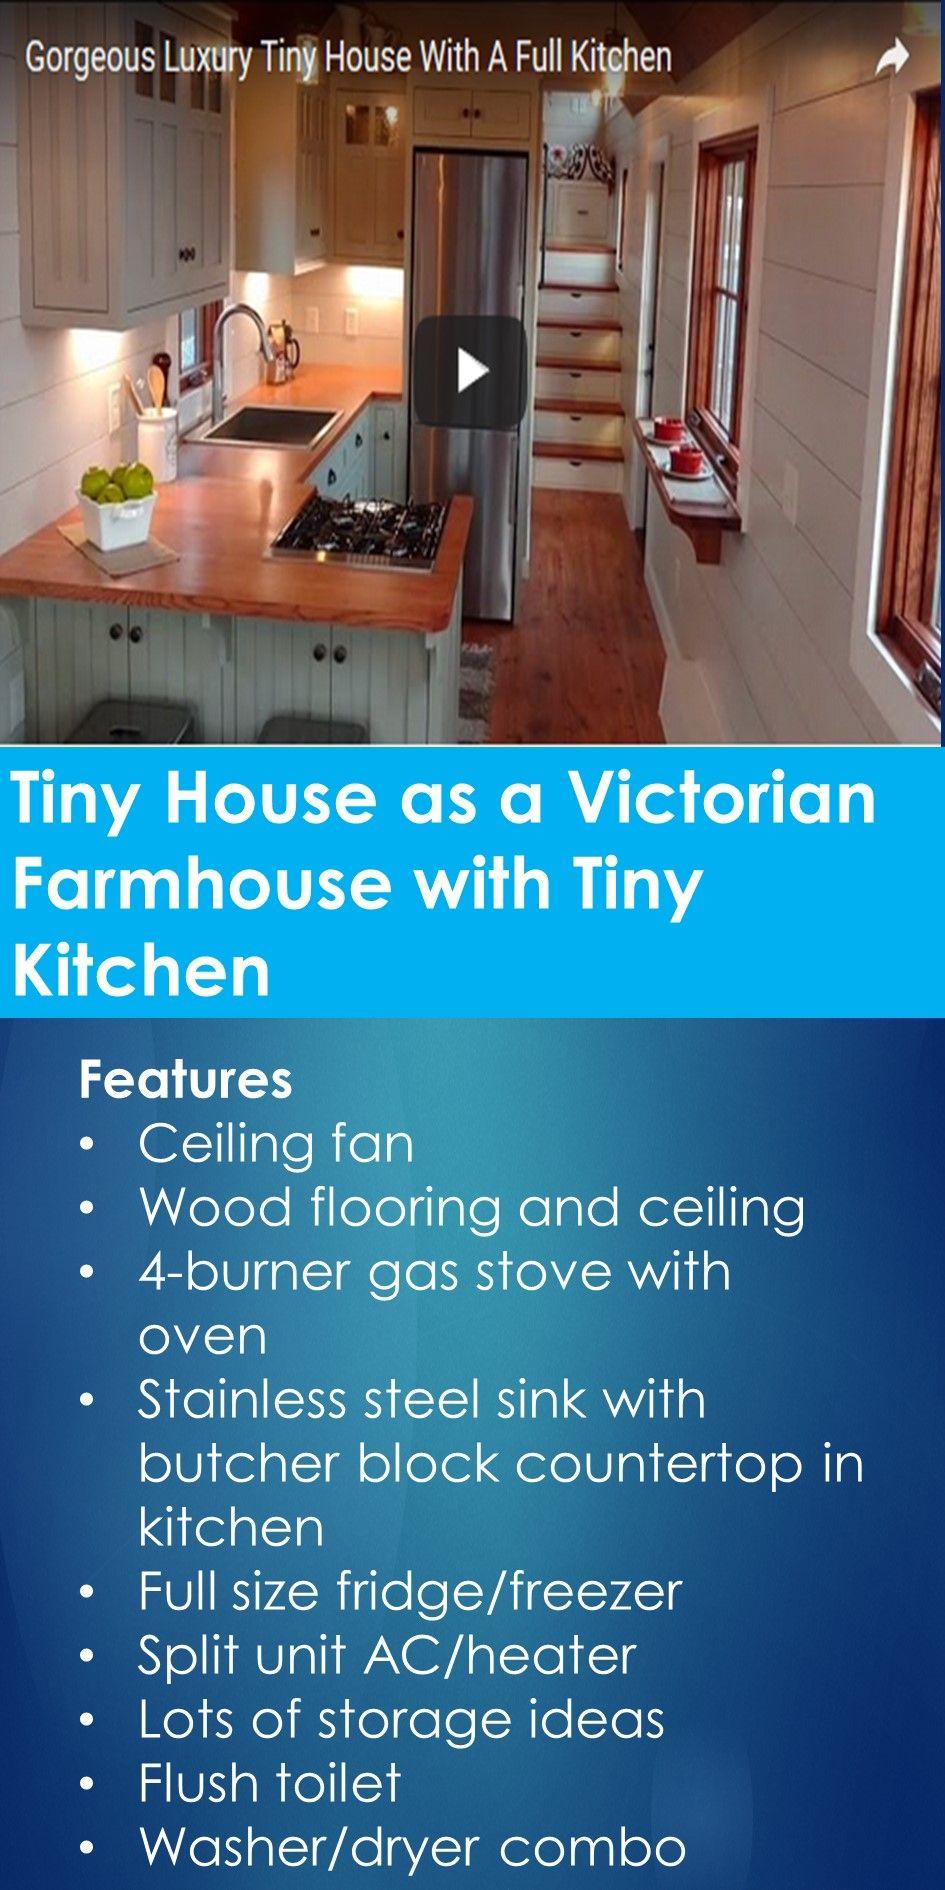 Tiny House as a Victorian Farmhouse with Tiny Kitchen